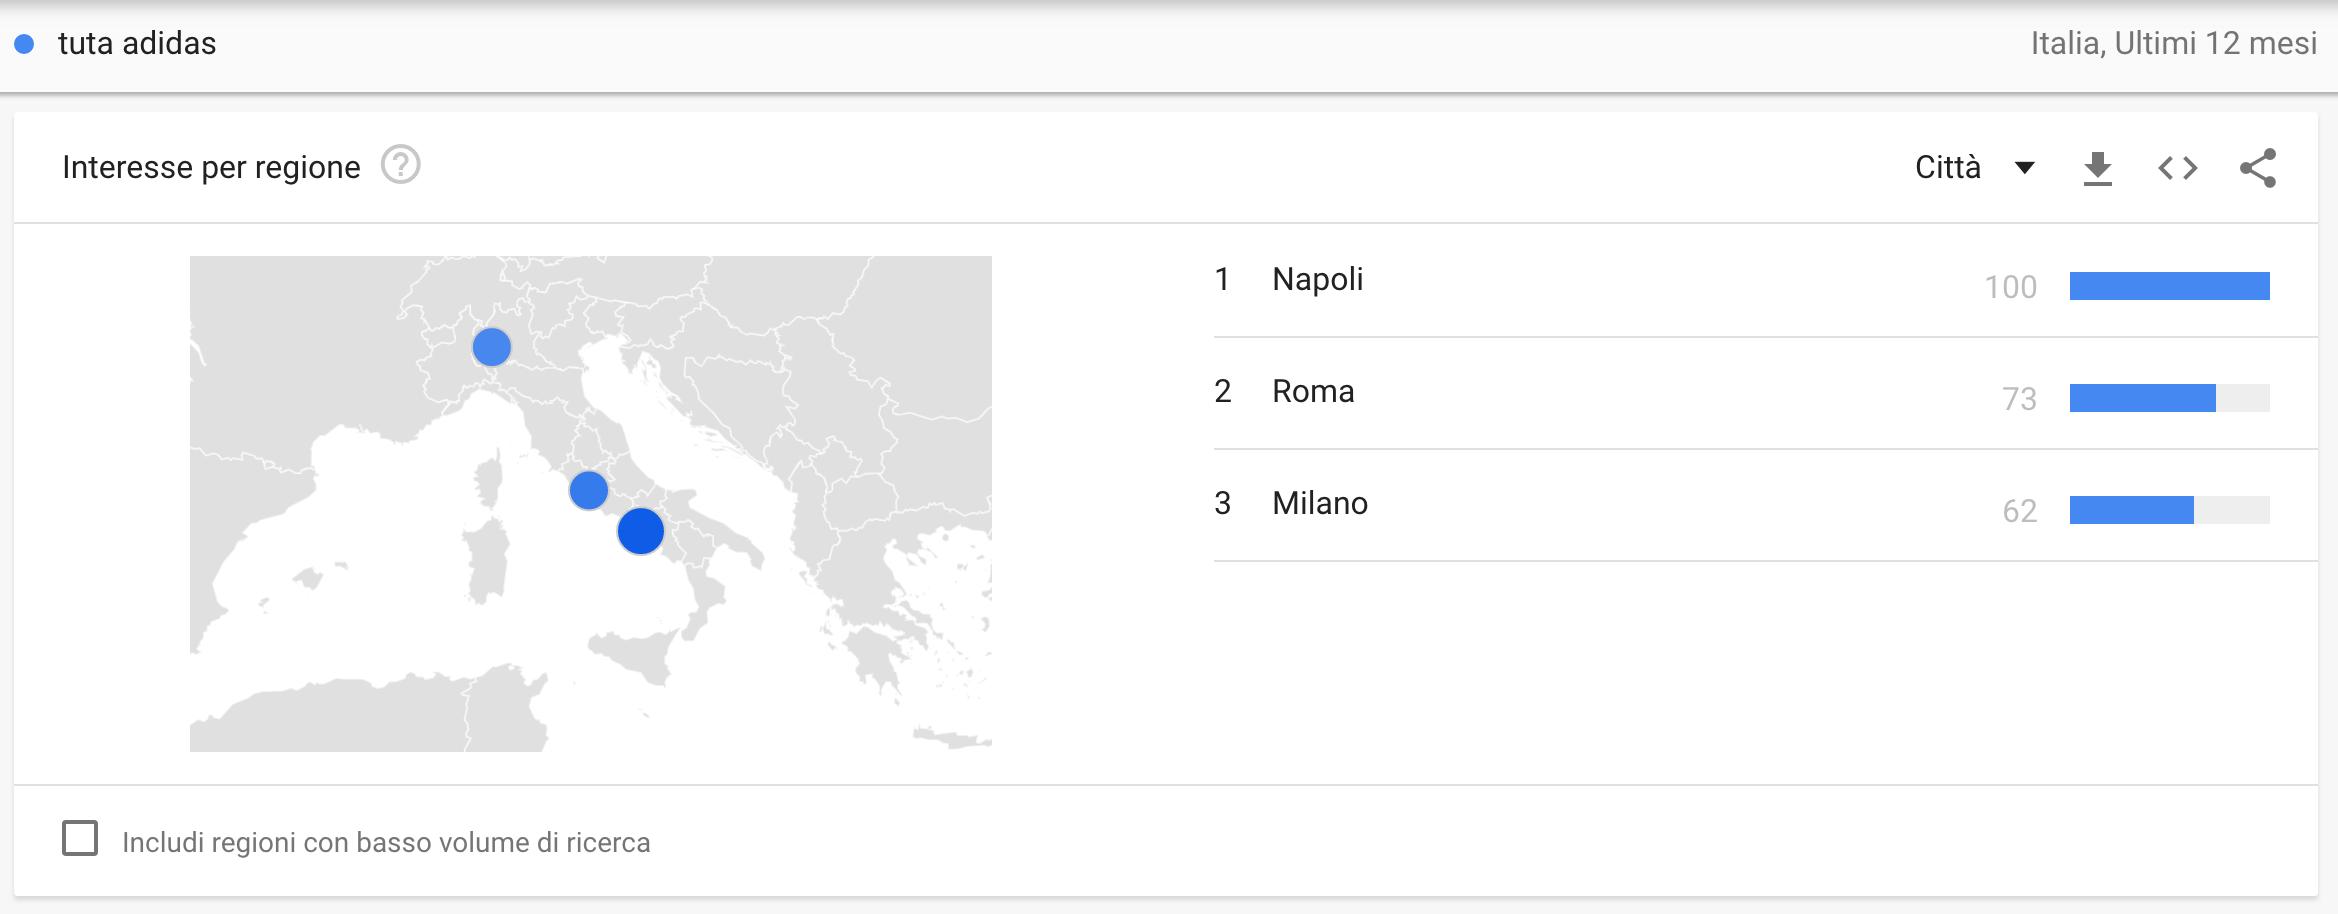 google trends città